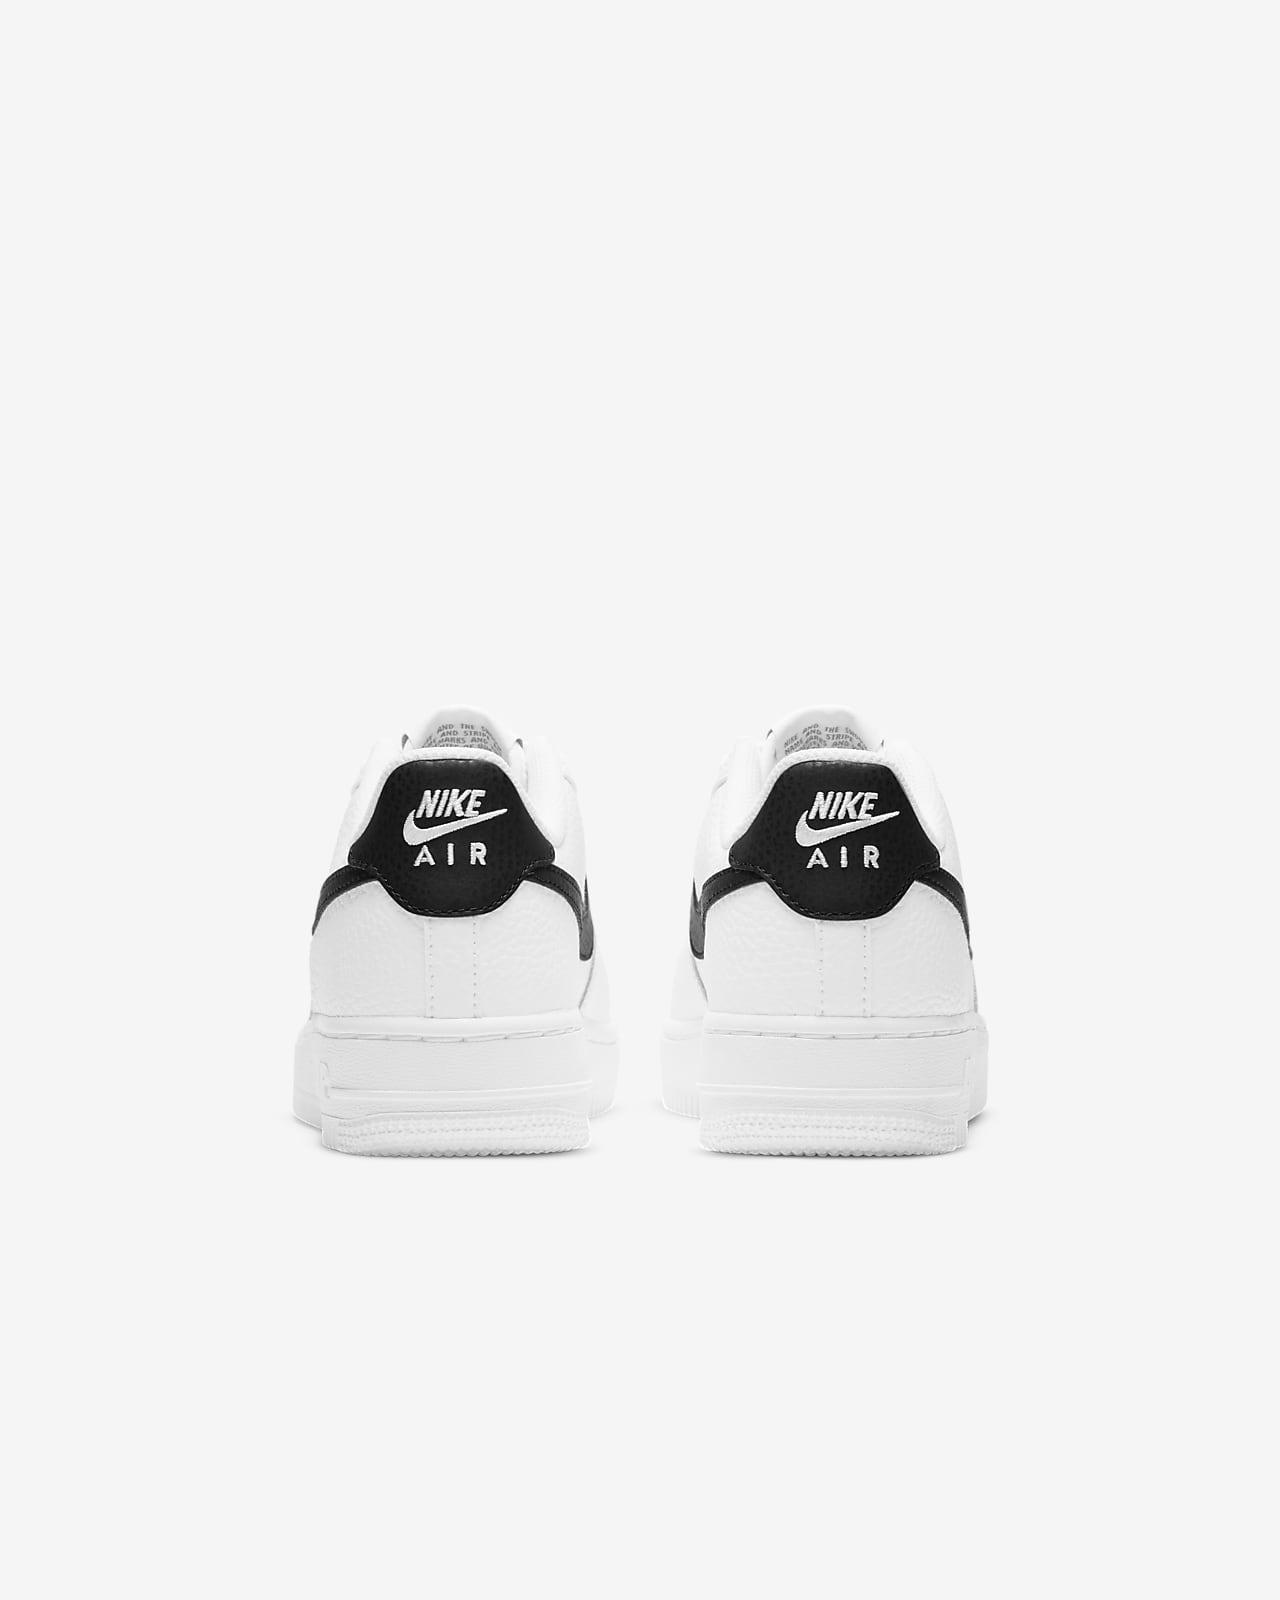 Nike Air Force 1 Older Kids' Shoes. Nike LU